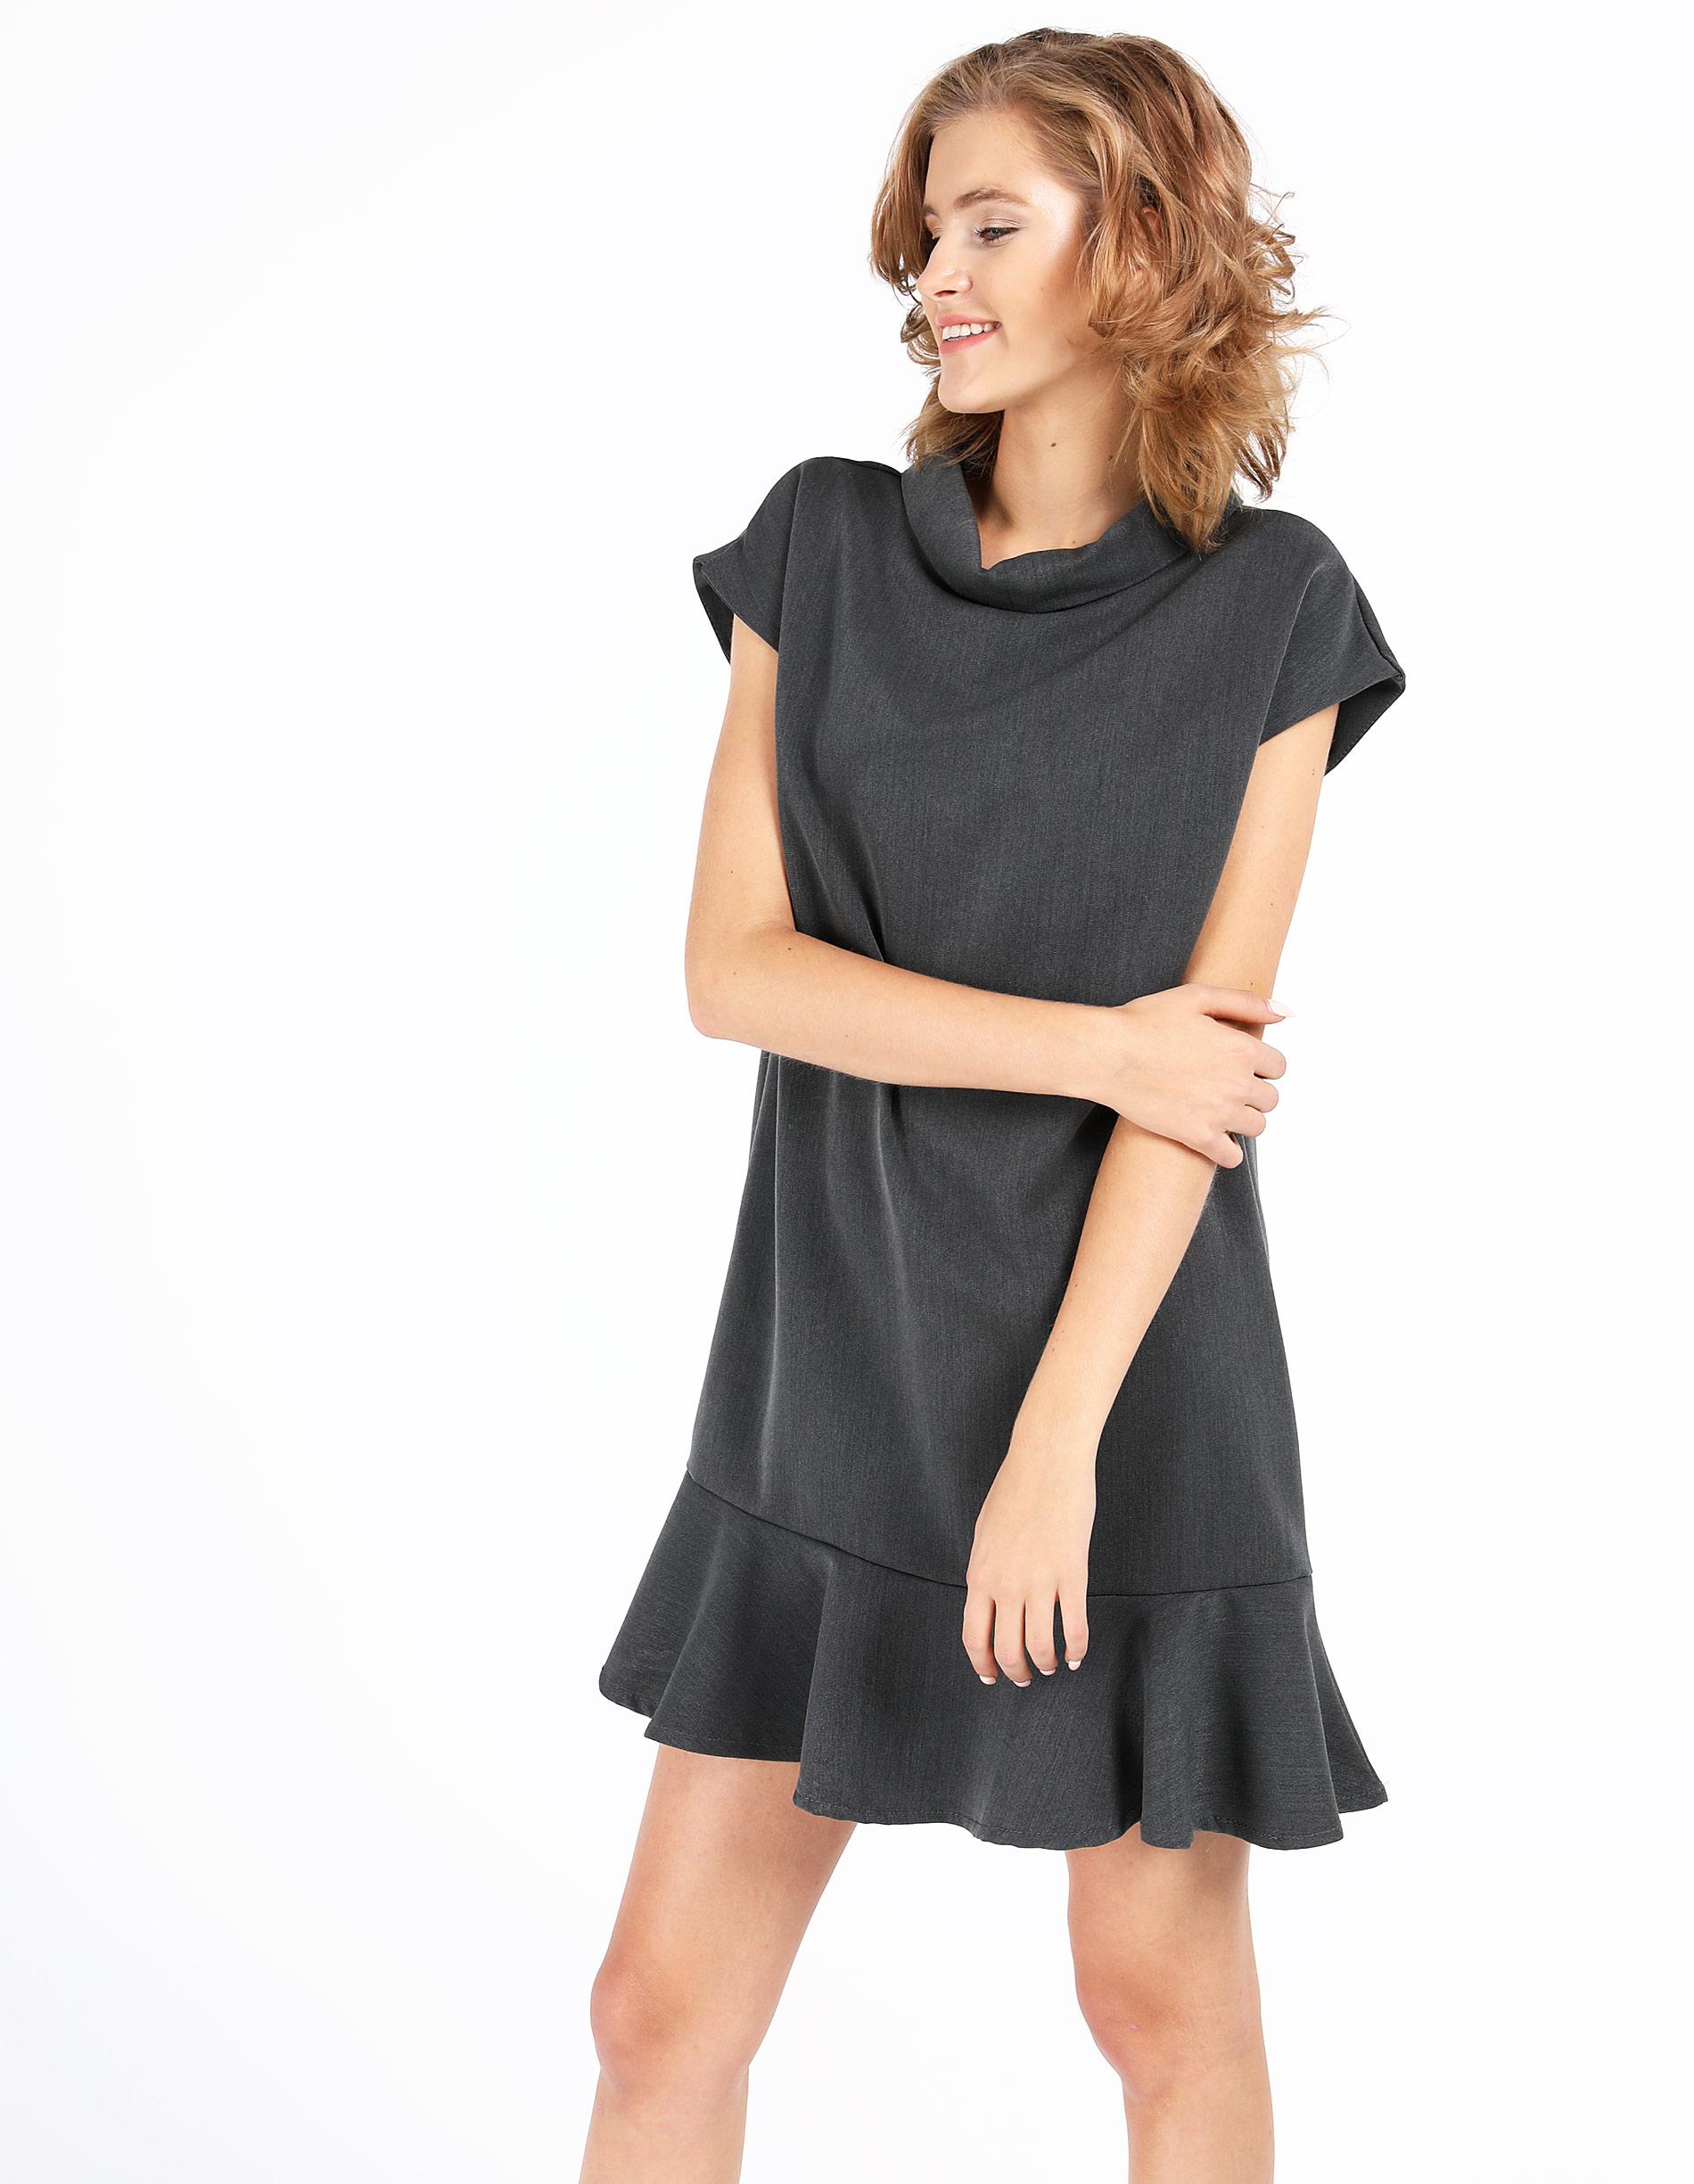 Sukienka - 59-80173 GRIG - Unisono